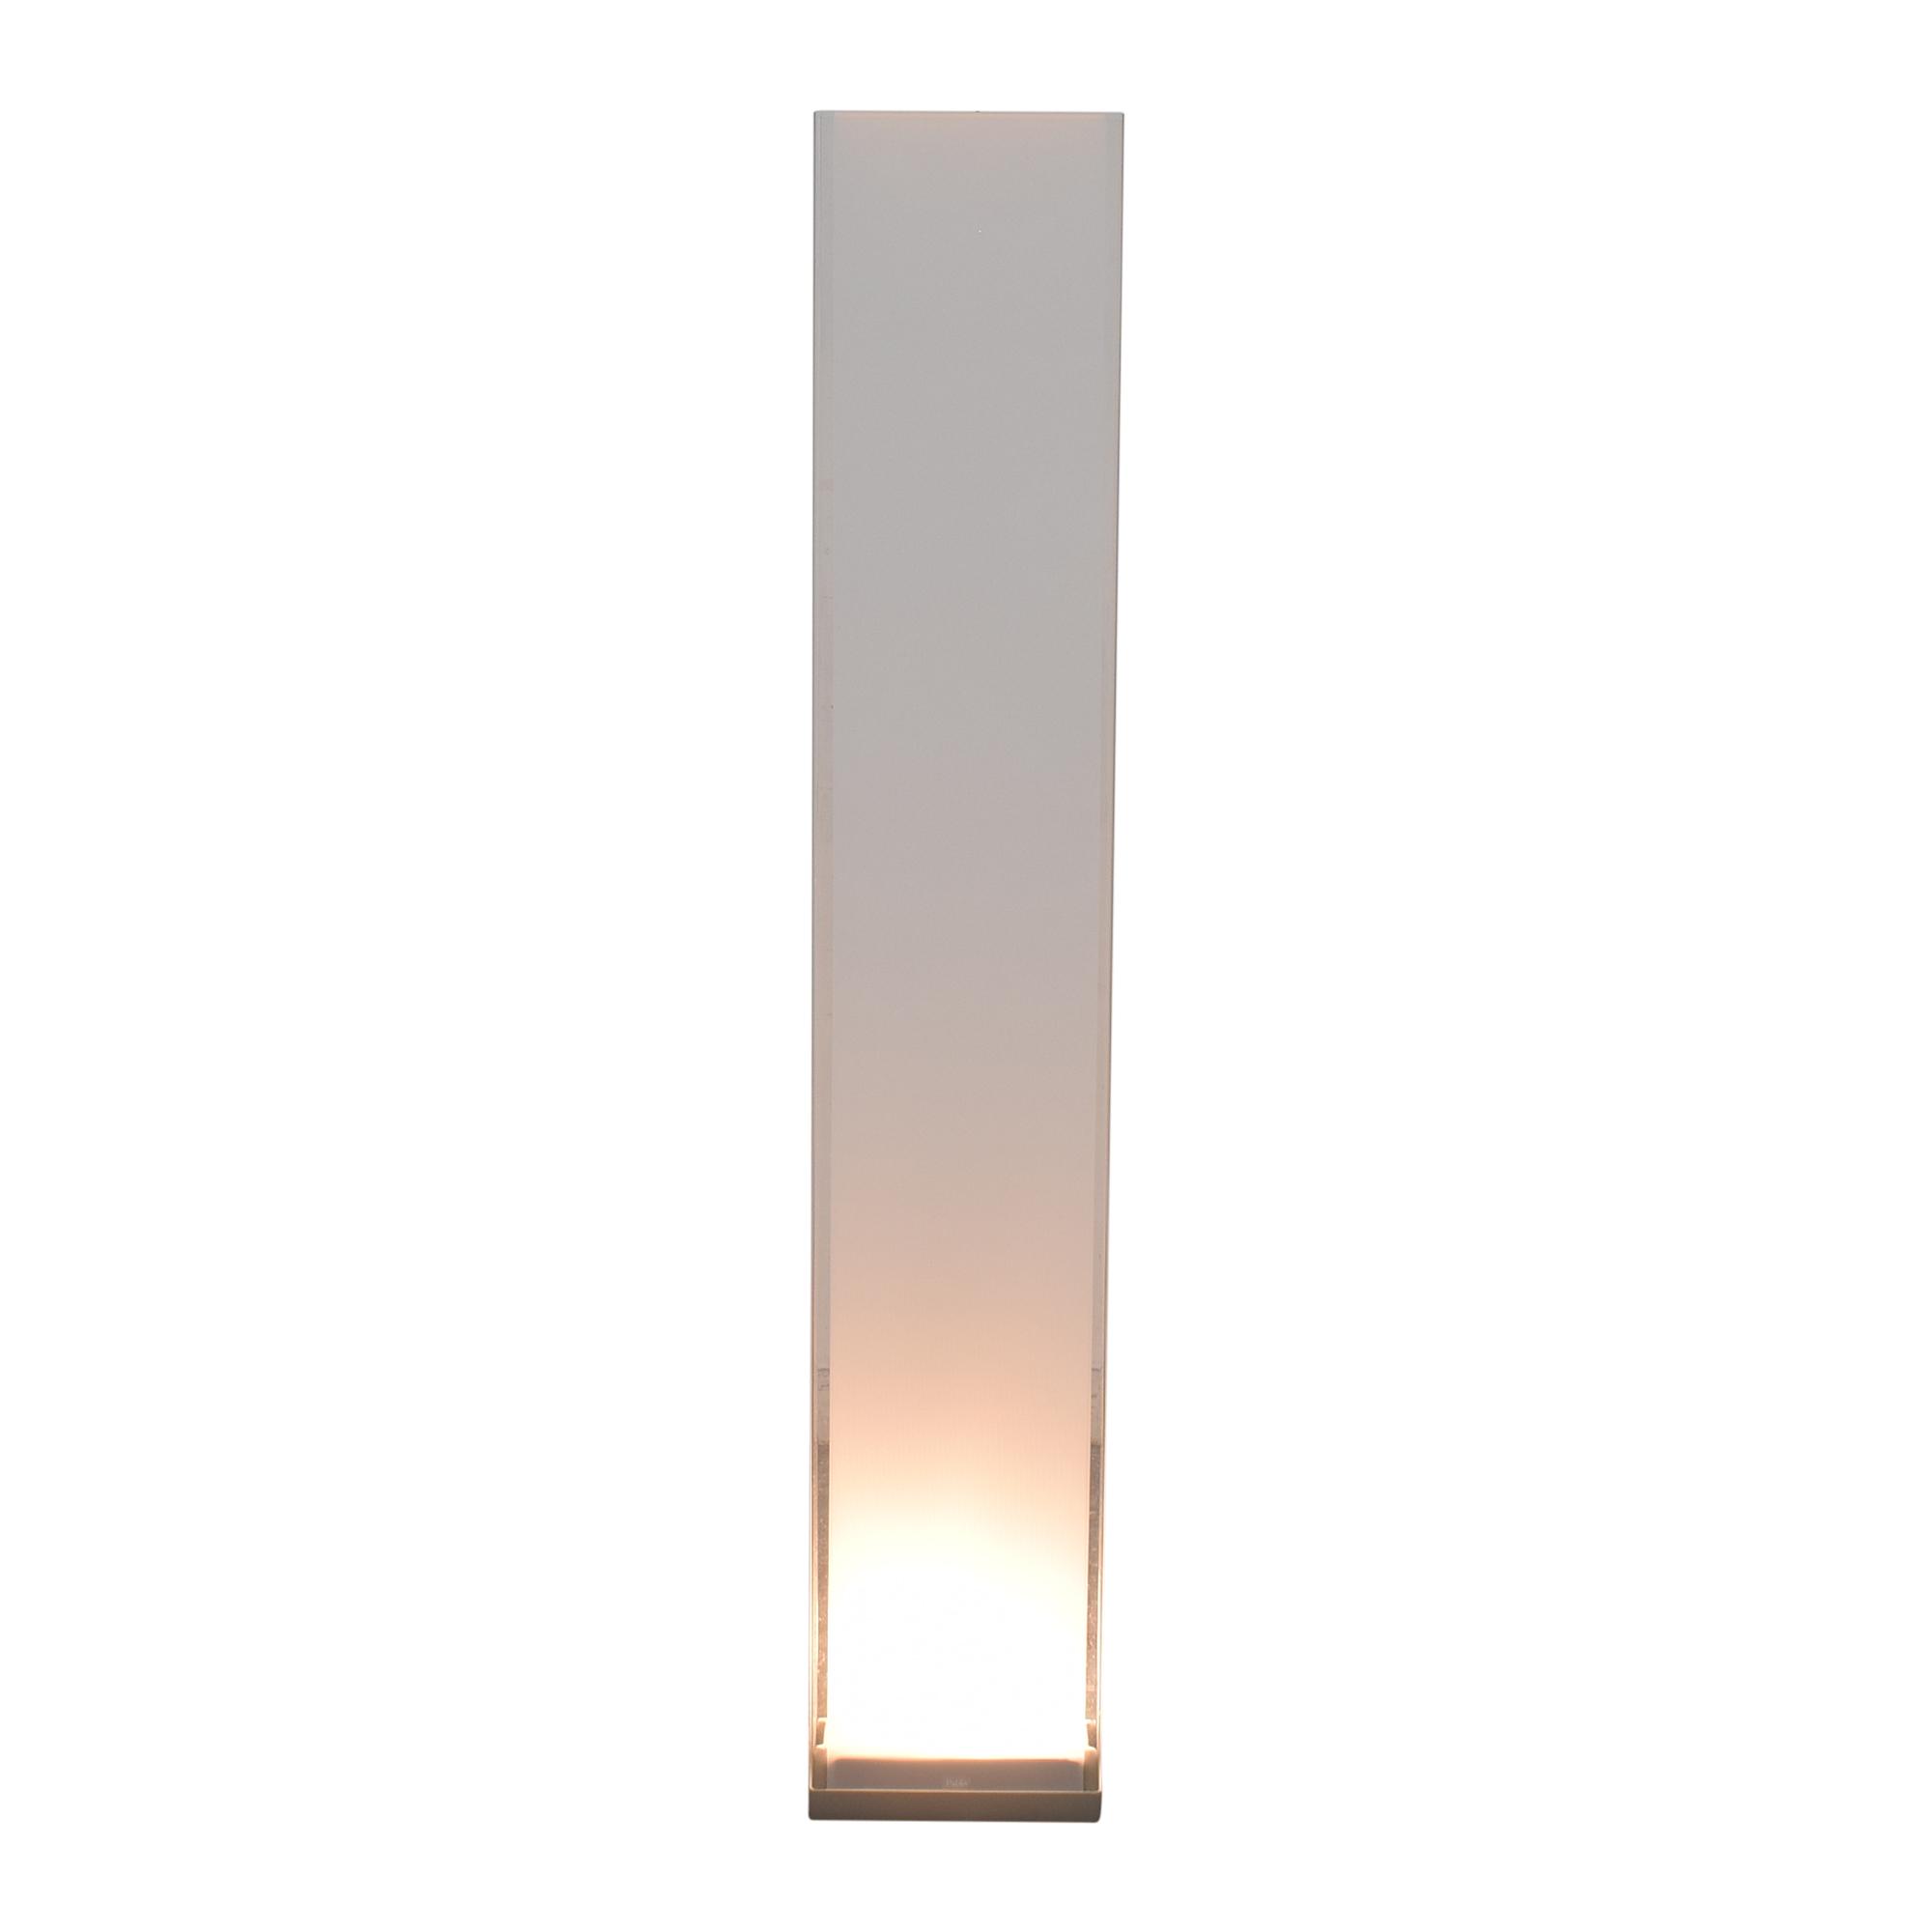 Pablo Designs Pablo Designs Cortina Modern Floor Lamp pa